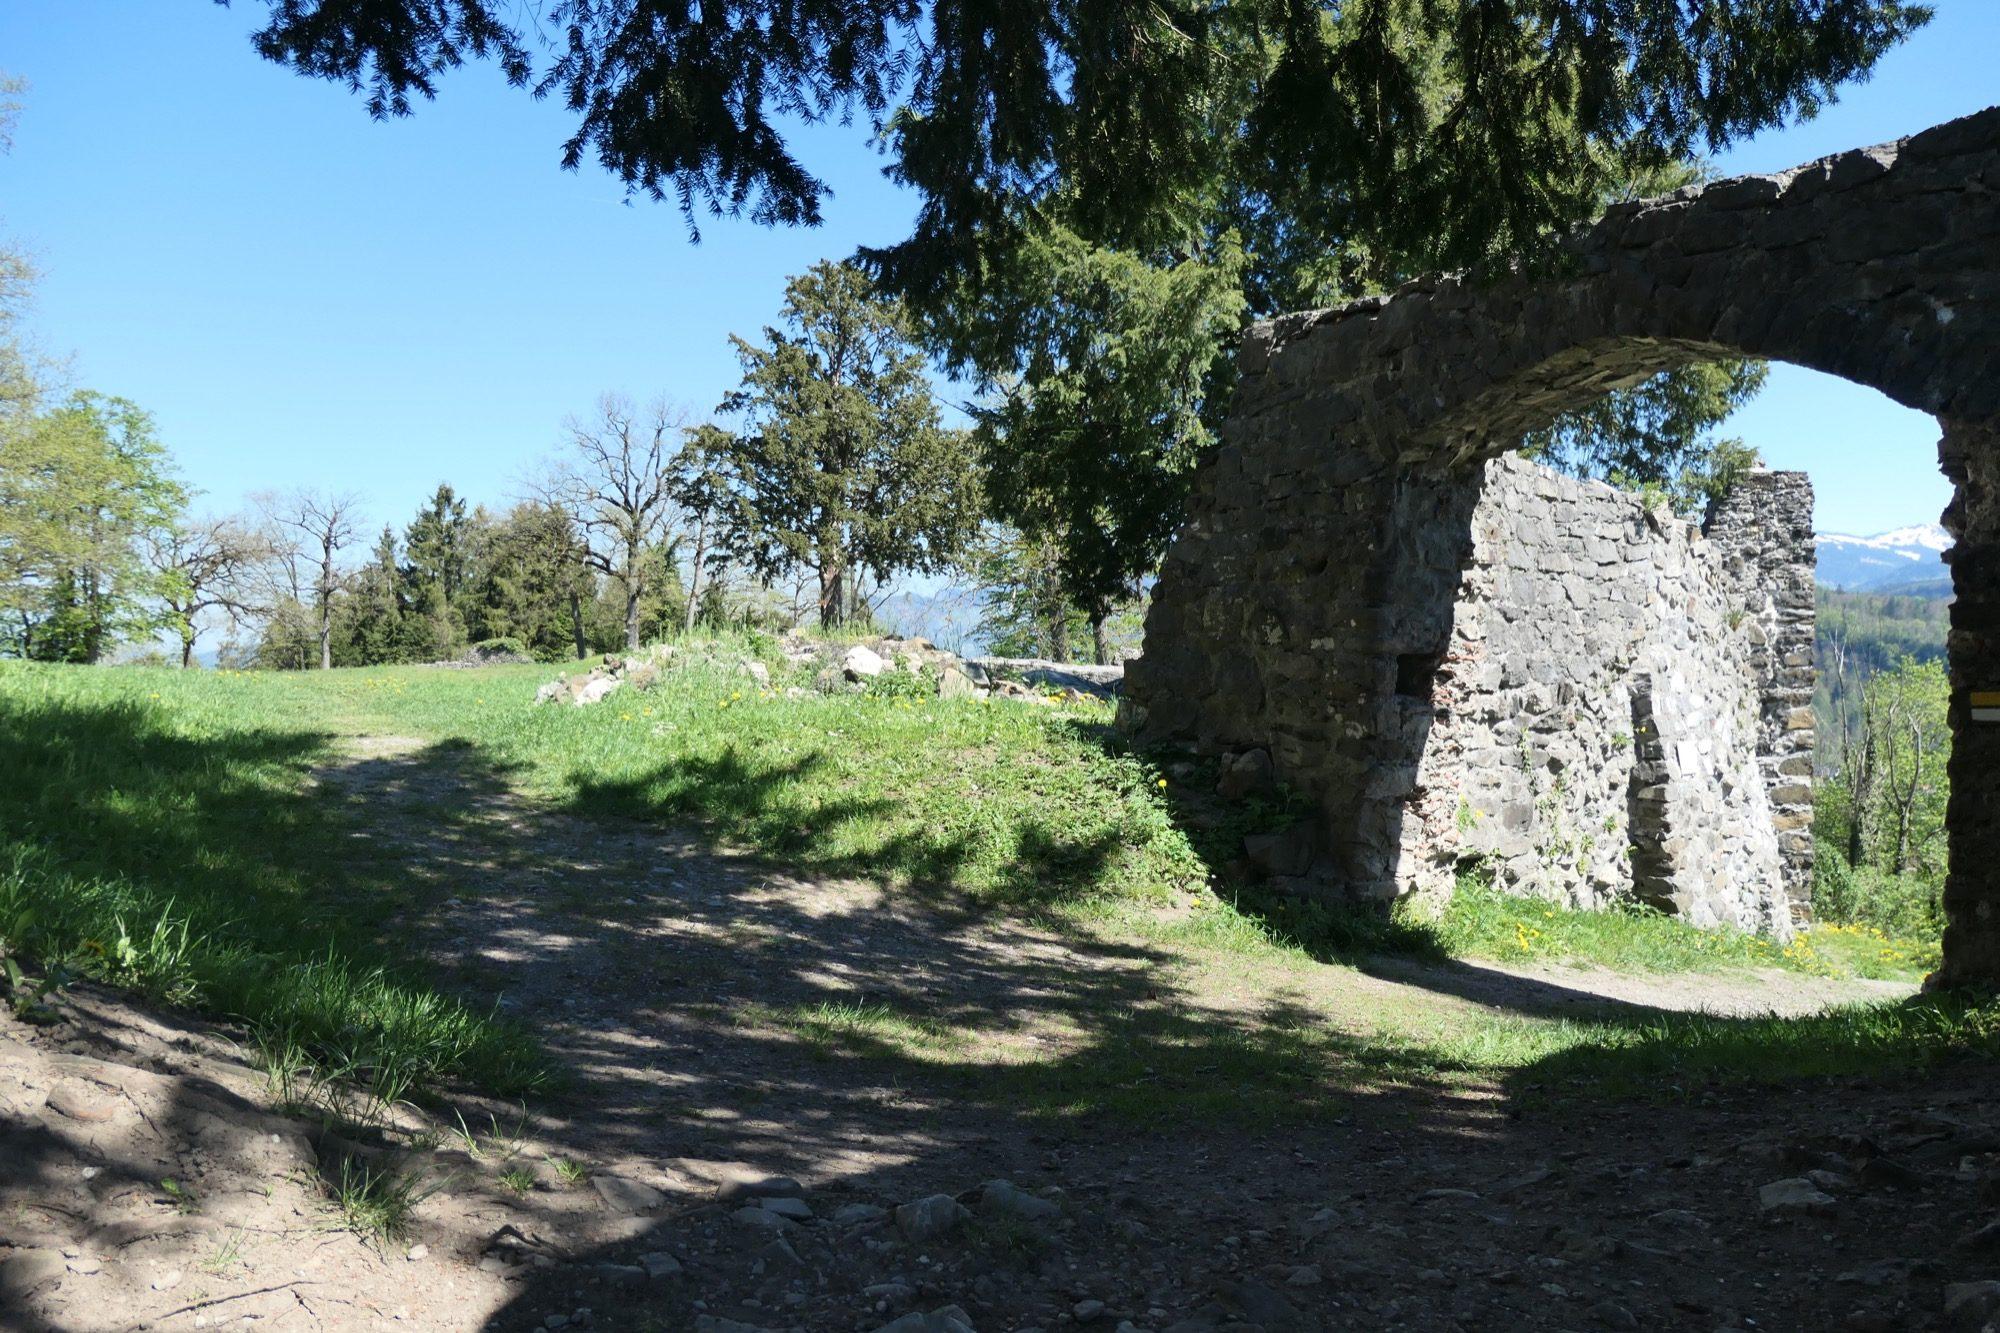 Main gate seen from inside